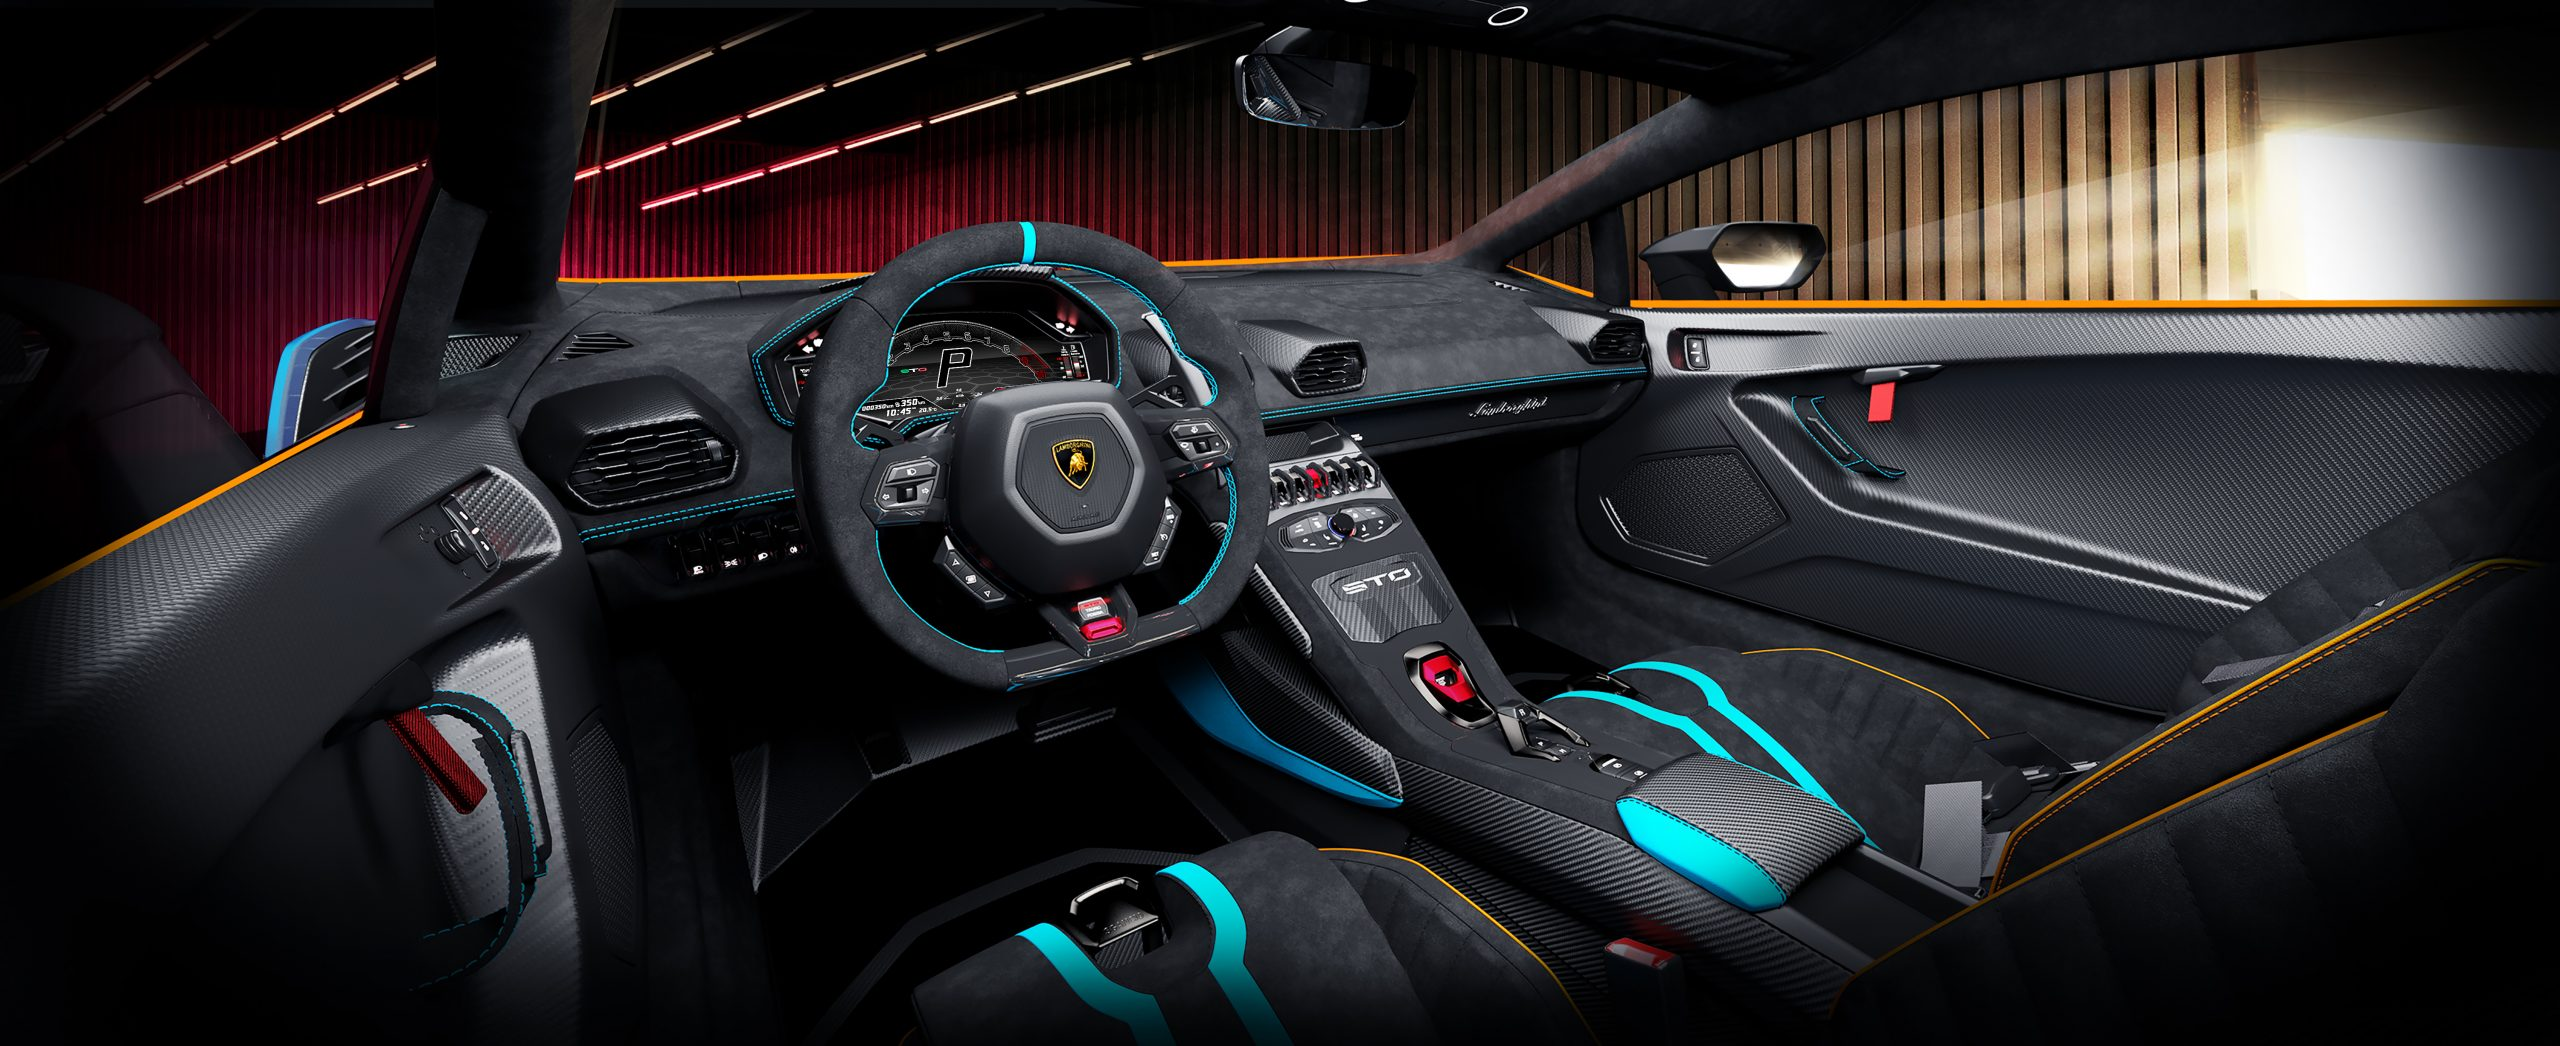 Lamborghini Huracan STO interior garage